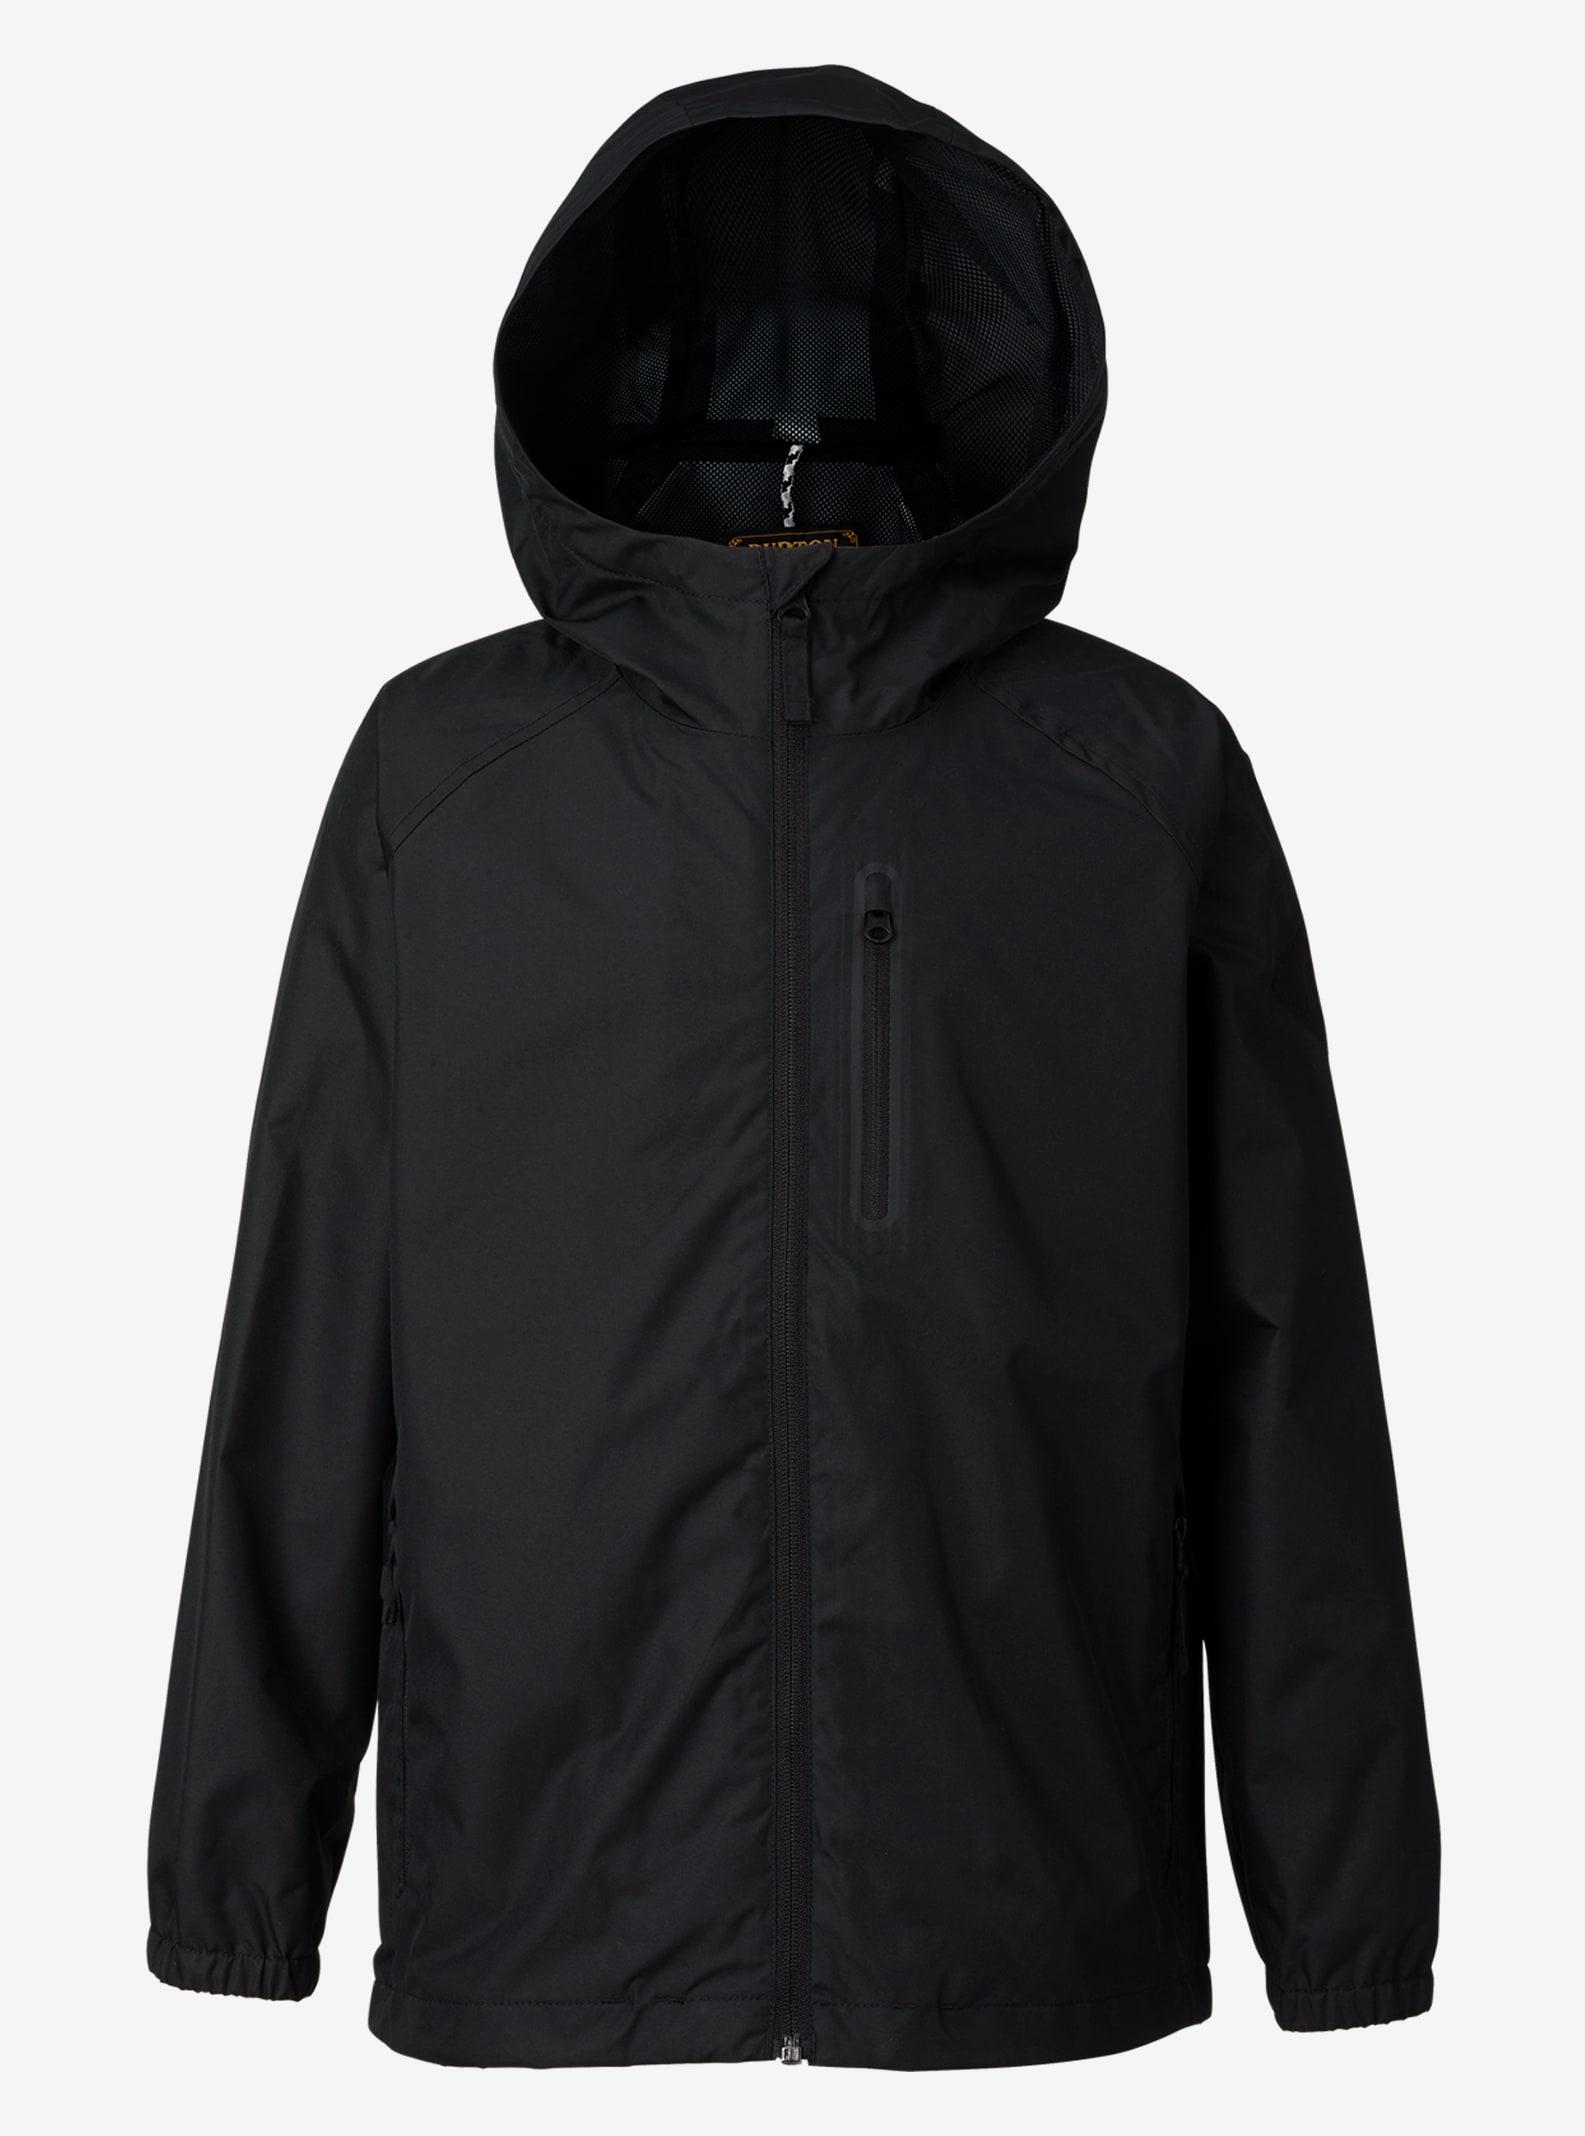 Burton Boys' Portal Rain Jacket shown in True Black